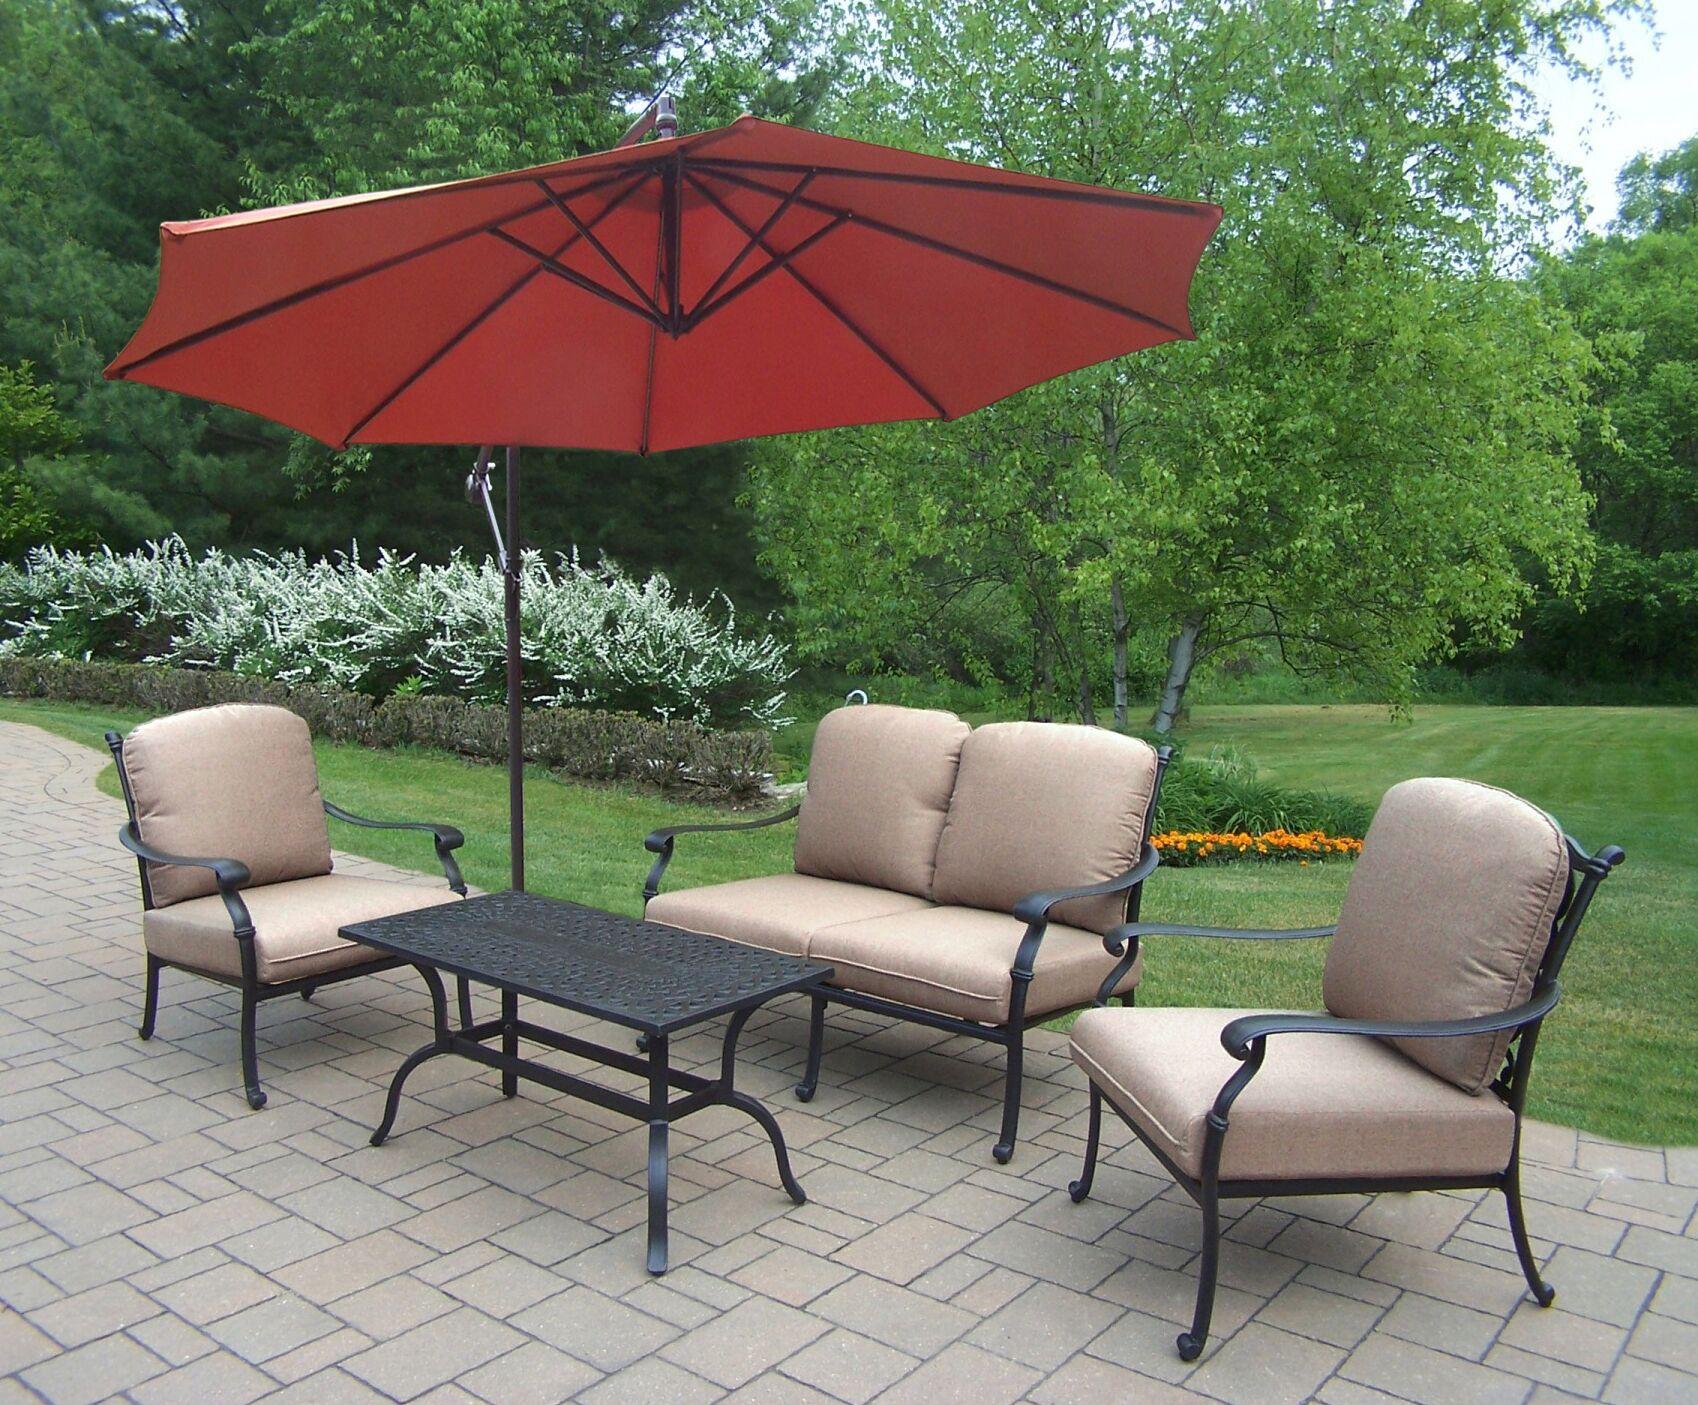 Bosch 5 Piece Sunbrella Sofa Set with Cushions Cushion Fabric: Standard - Tan